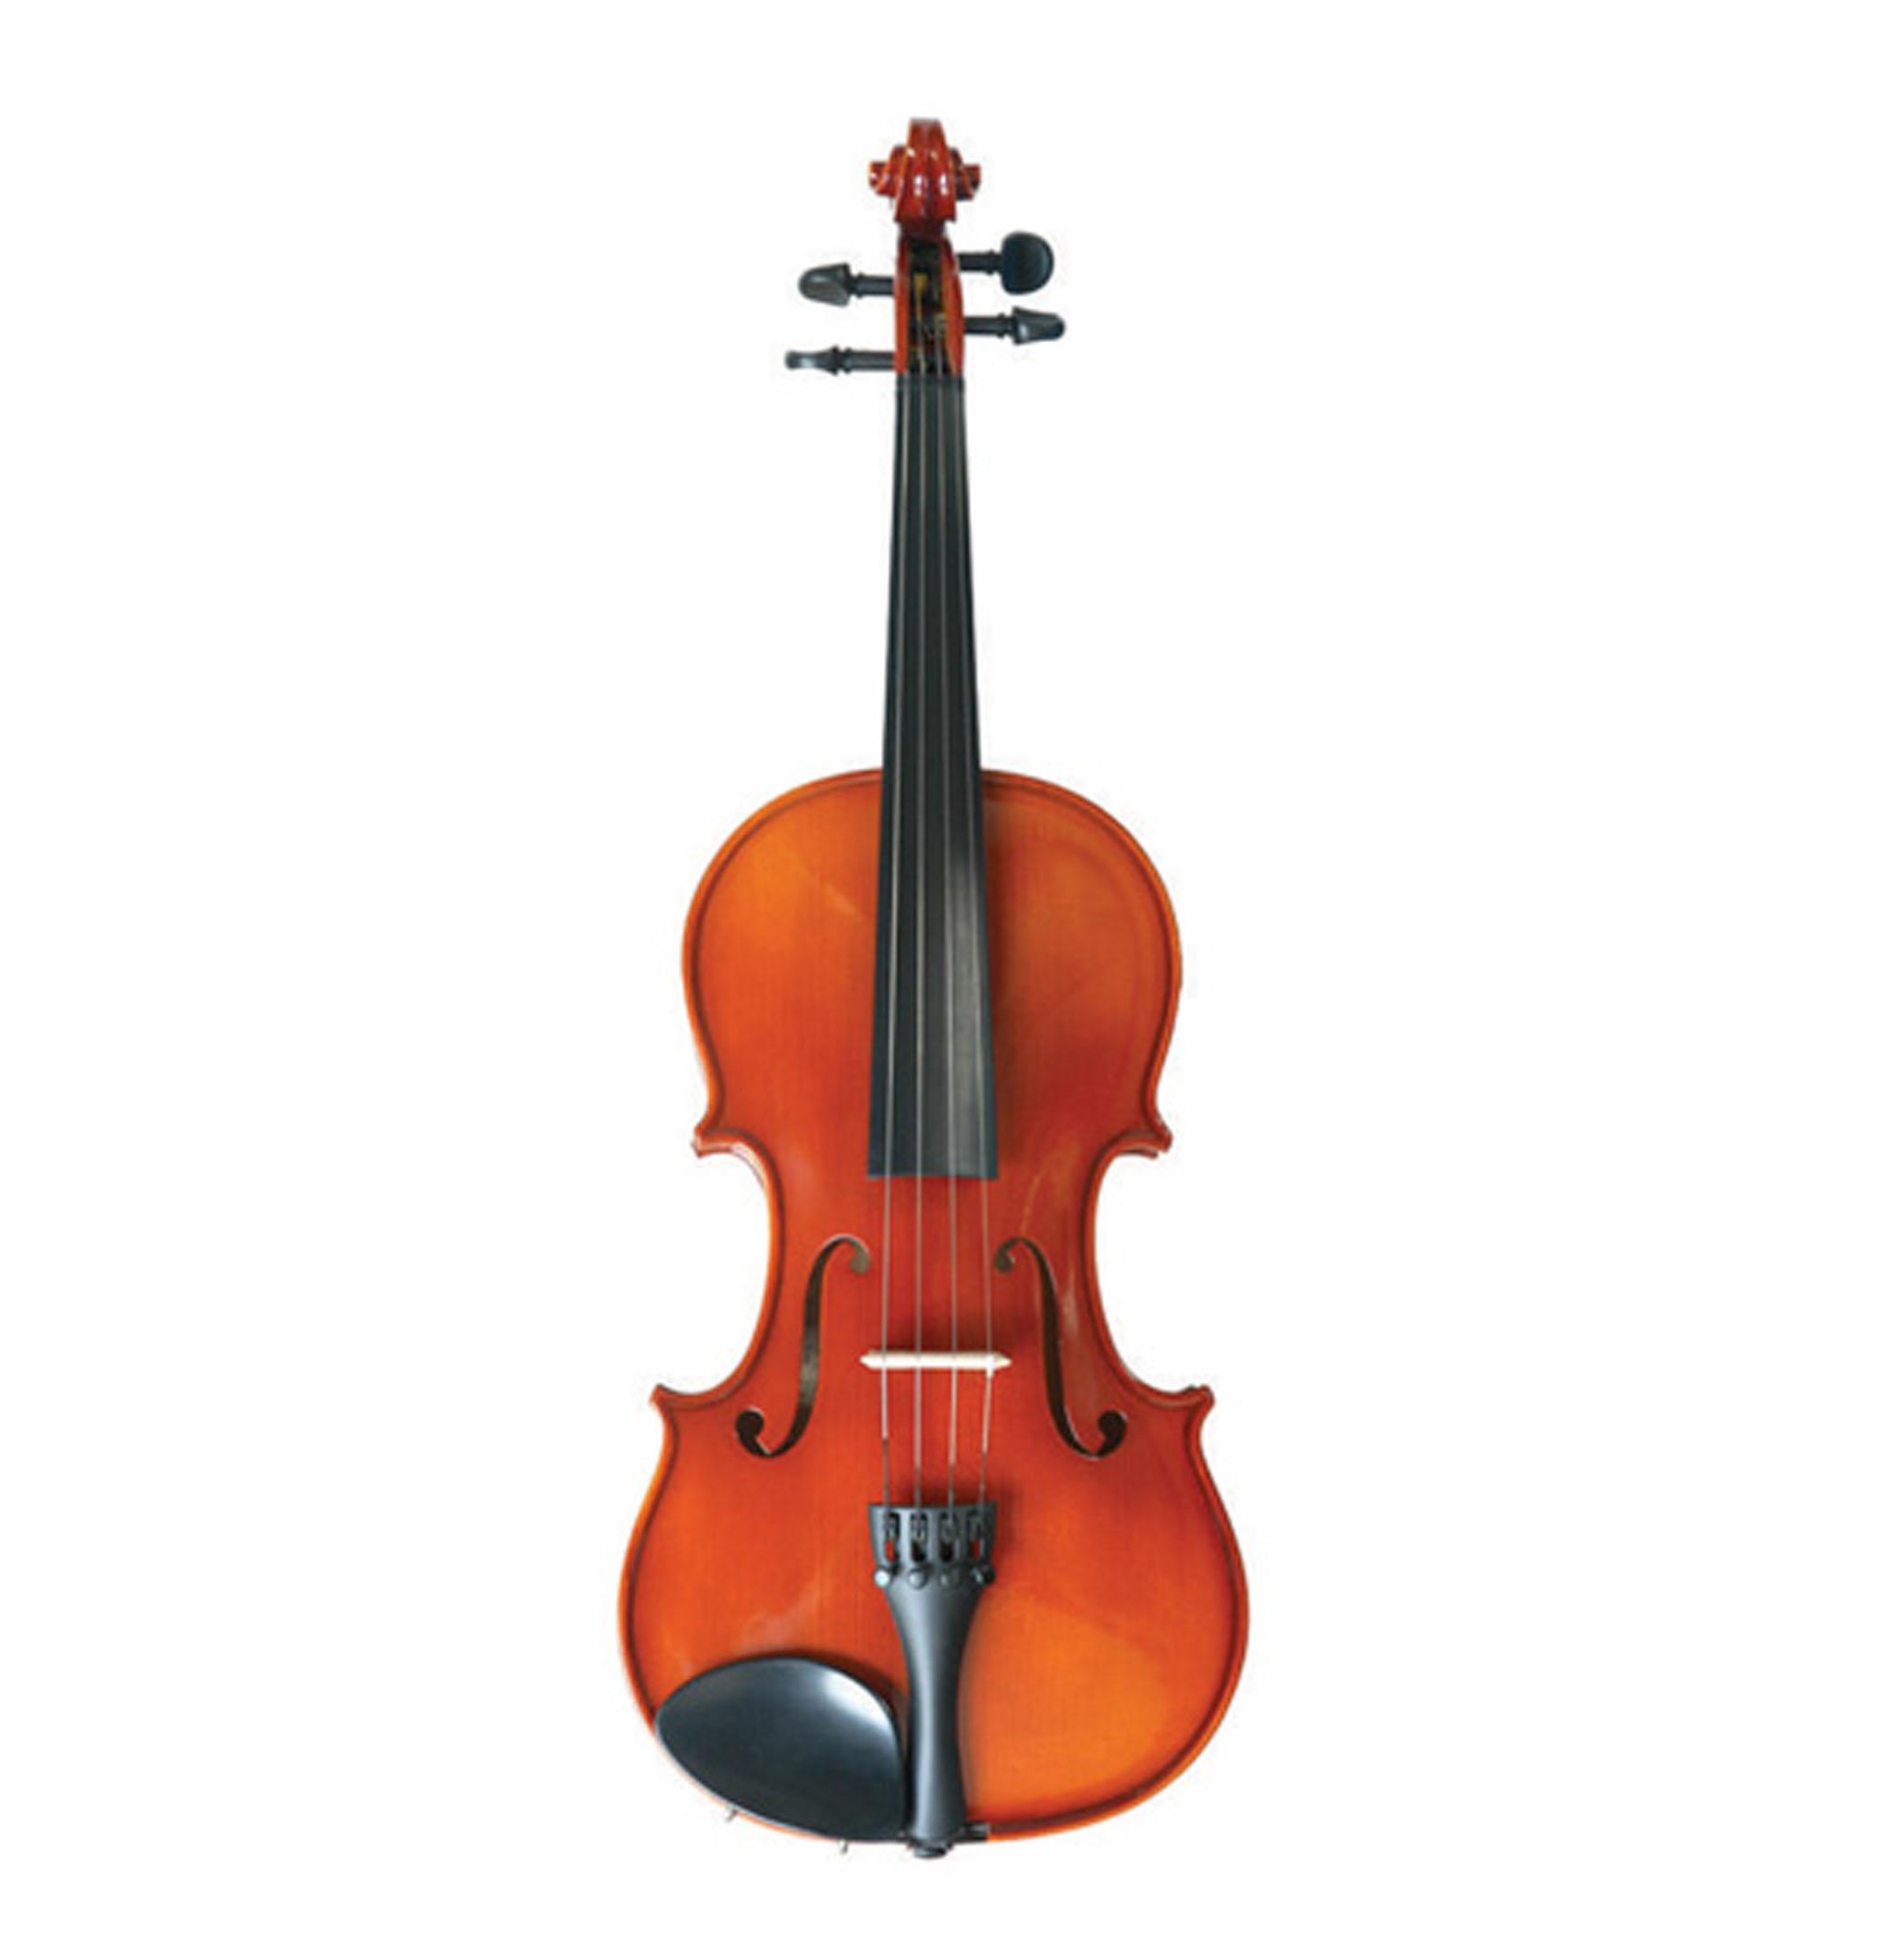 Đàn Violin Suzuki NS 20FIT Size 3/4